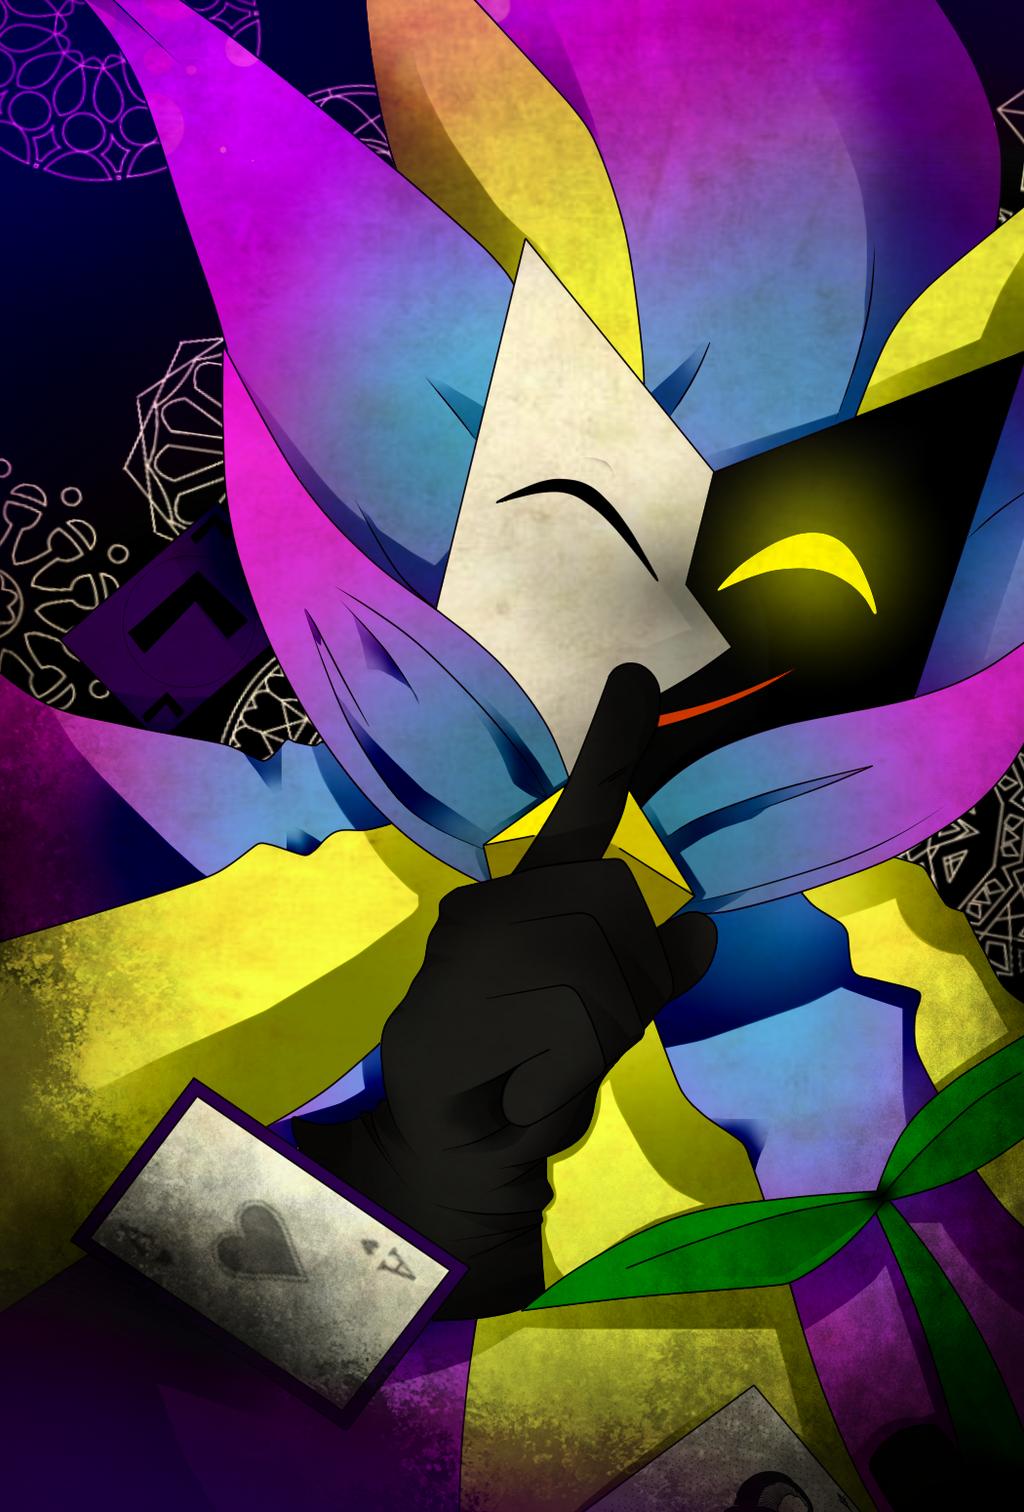 Fight by my side! by KiShinYuu